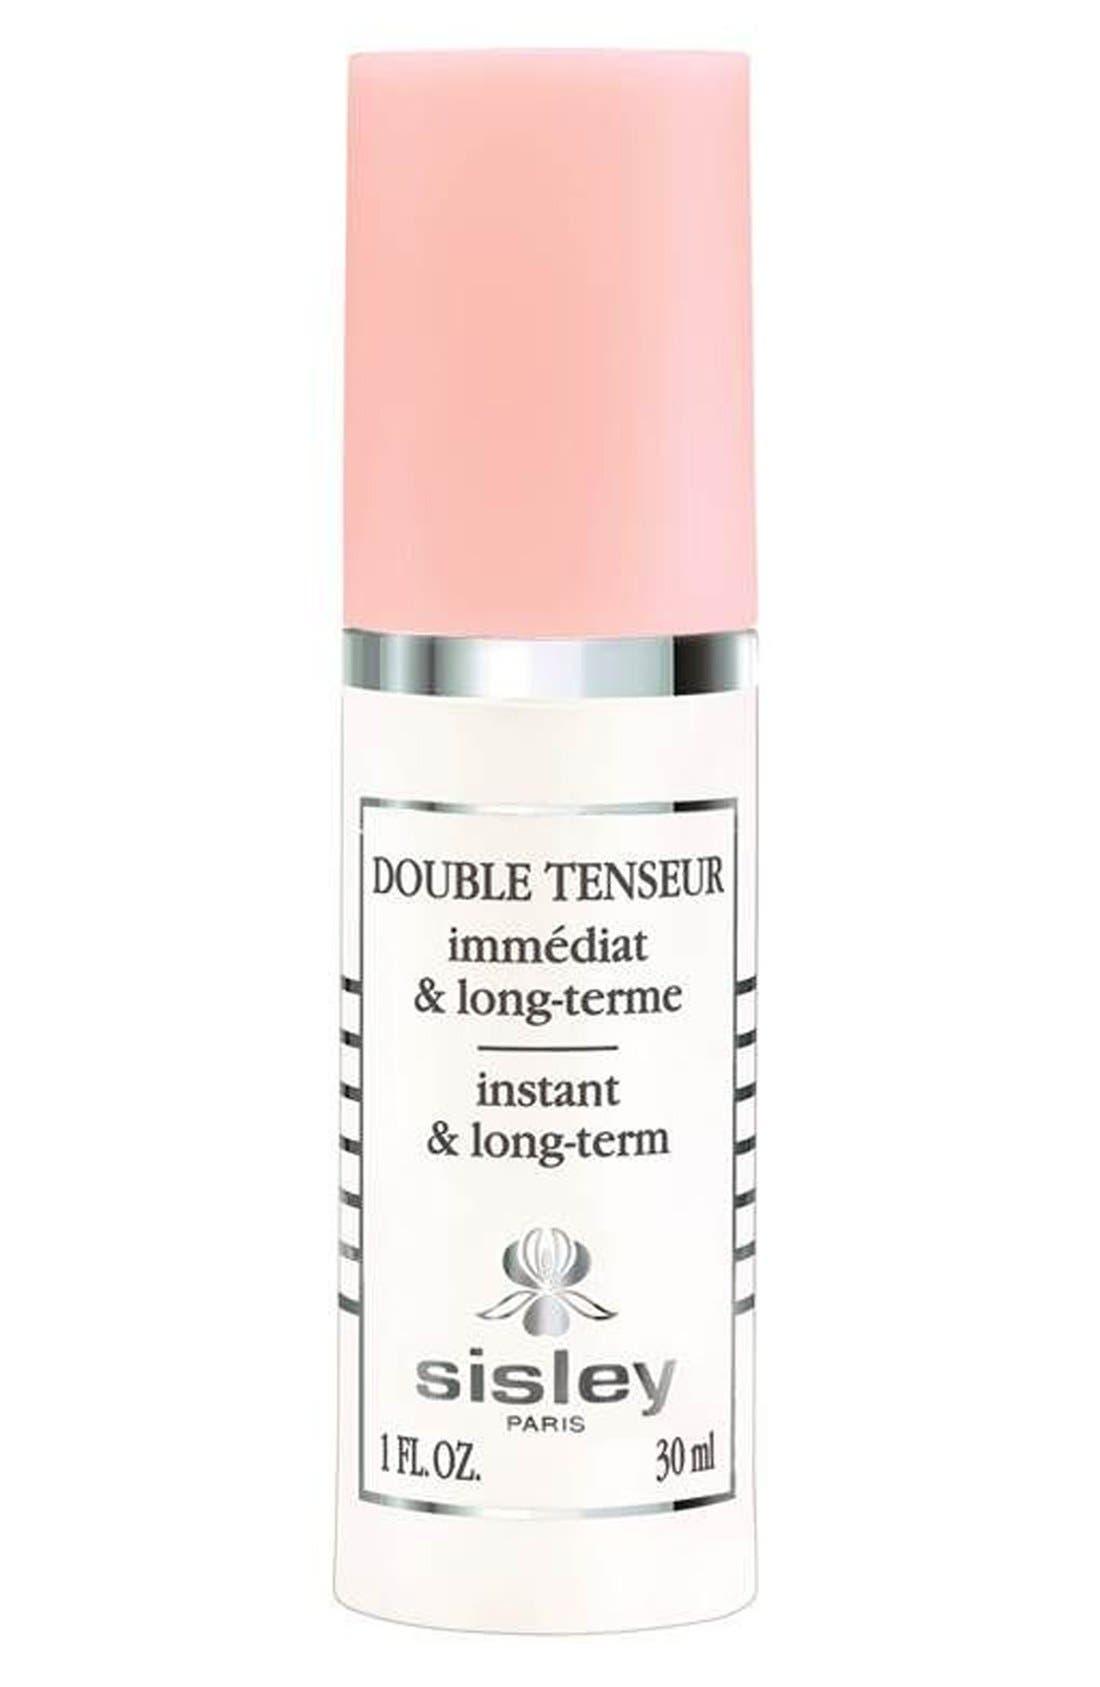 Sisley Paris 'Double Tenseur' Moisturizing Gel